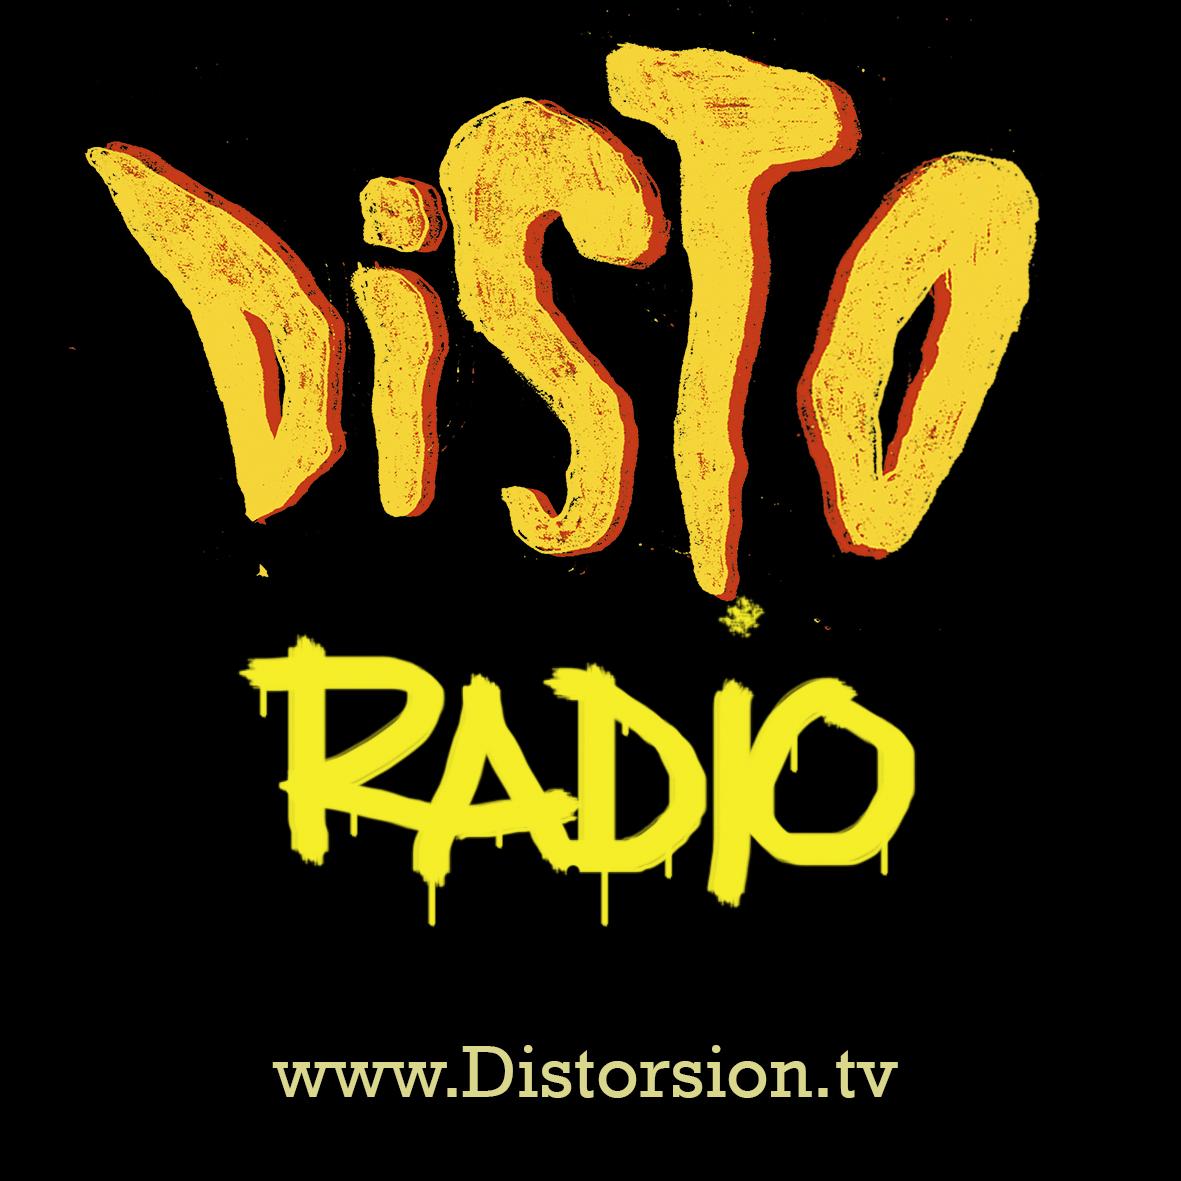 Disto Radio logo